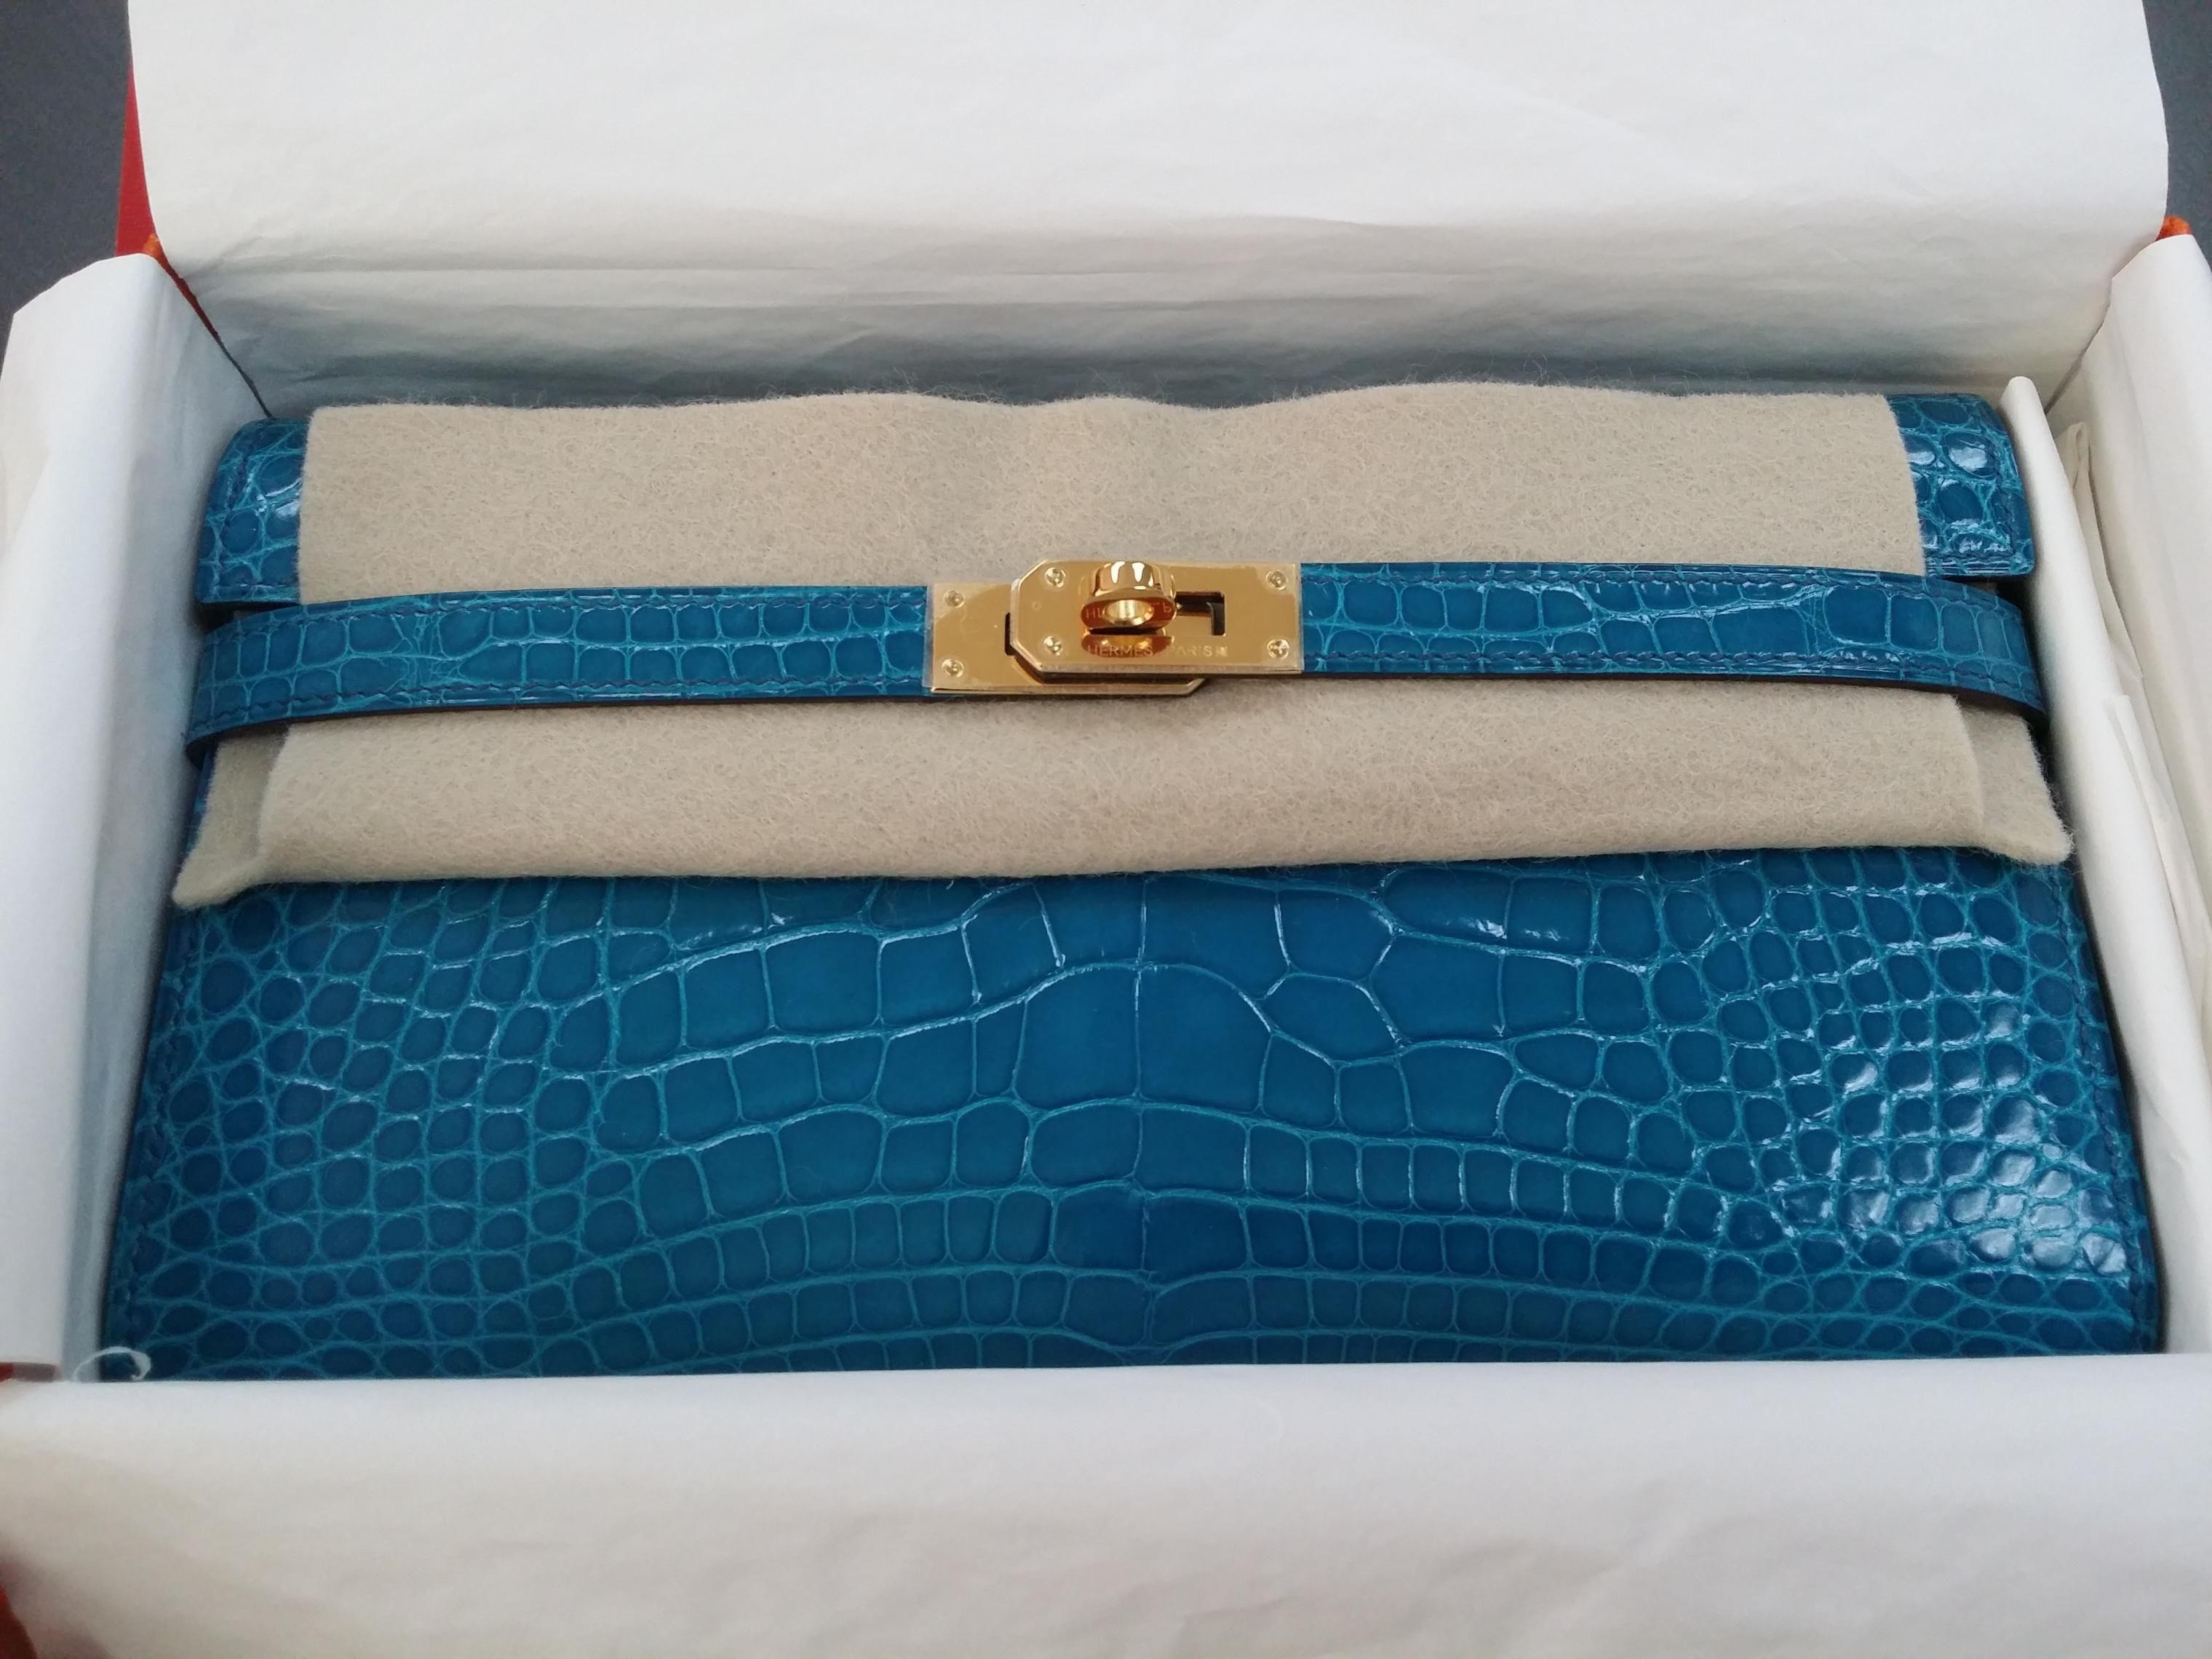 016d7e592d Hermes Croc Kelly Wallet - Blue Izmir